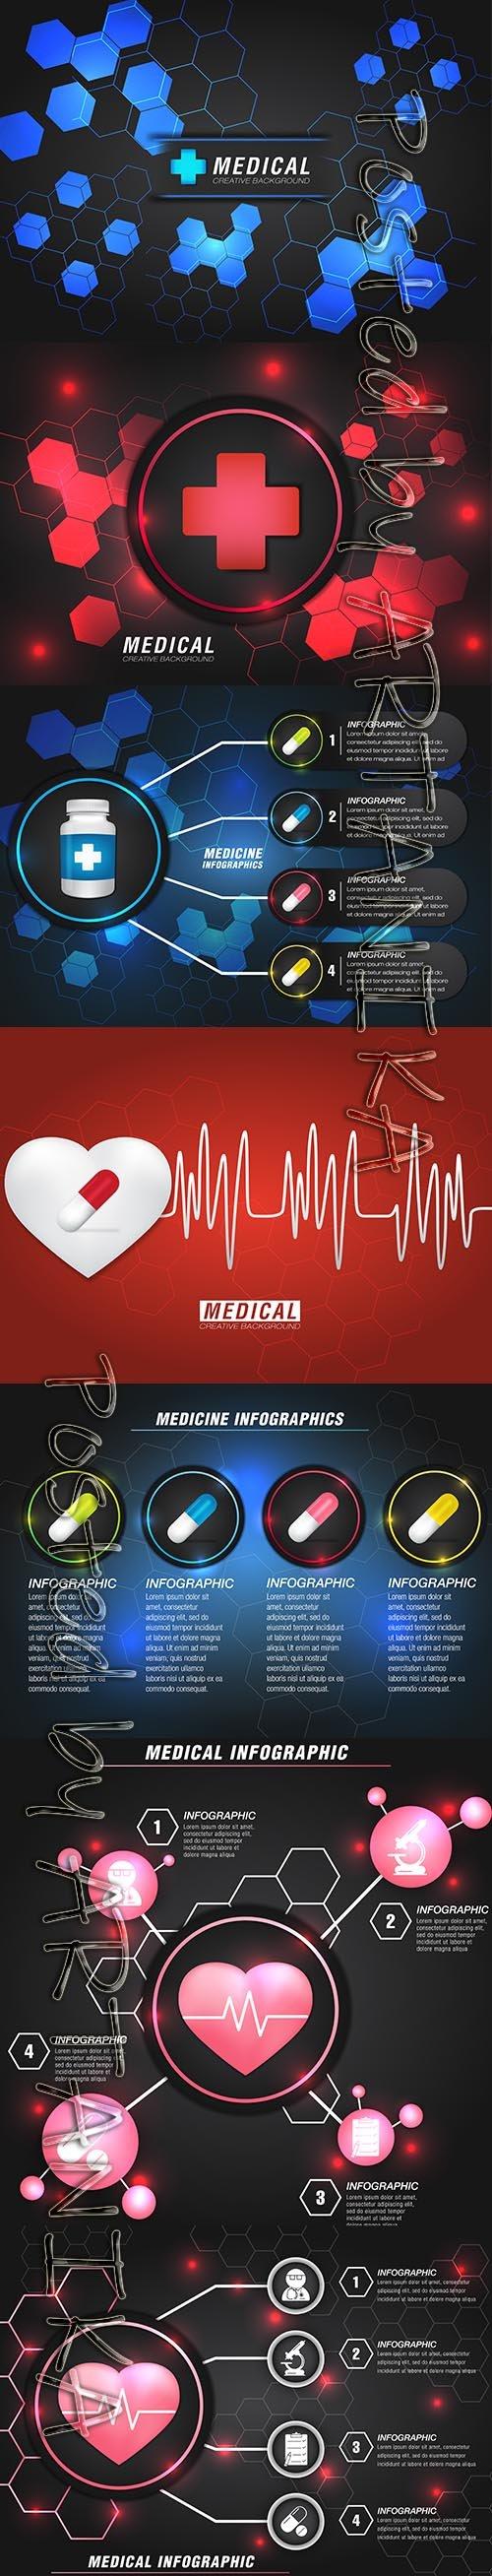 Modern Medical Infographic Template Set